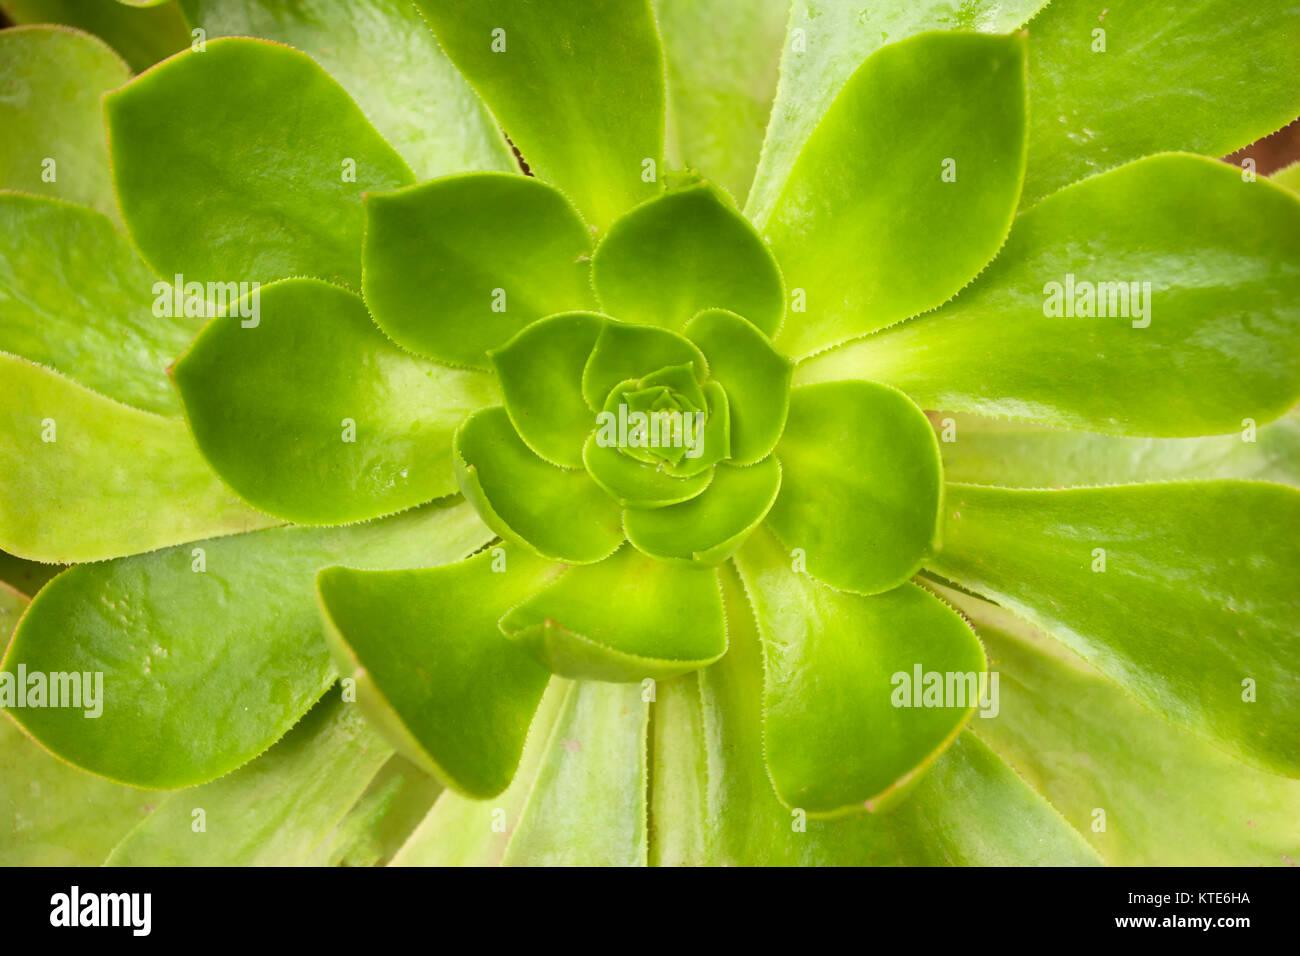 Echeveria succulent macro photograph, tenerife, spain, europe - Stock Image